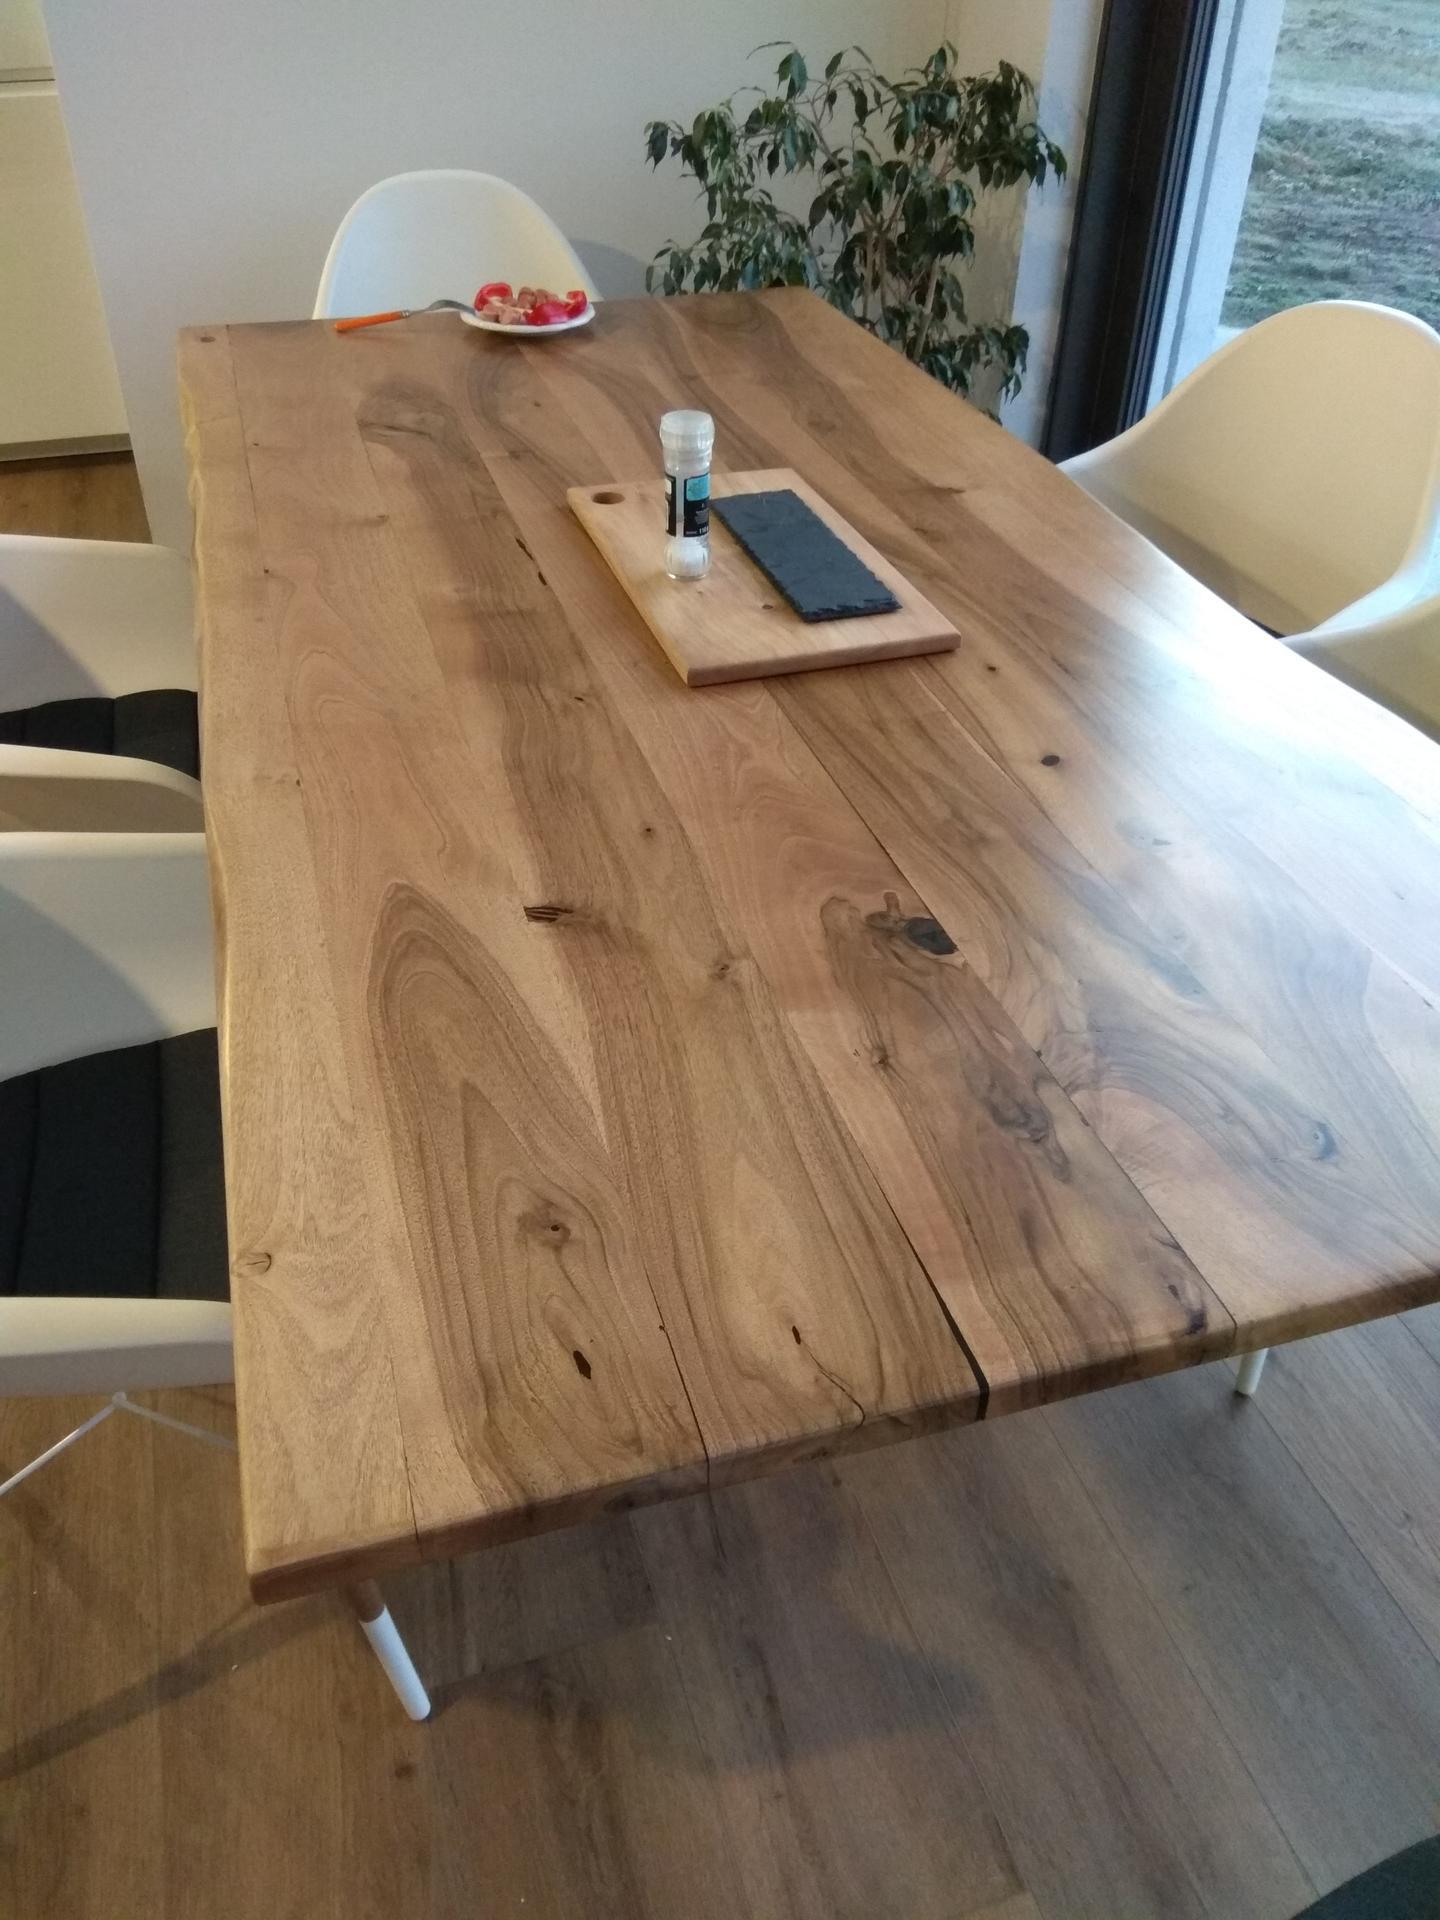 Orechový stôl - osmo myslim 2-3krat nater, neskor som pridal este tonovany osmo nater preto zmena farby